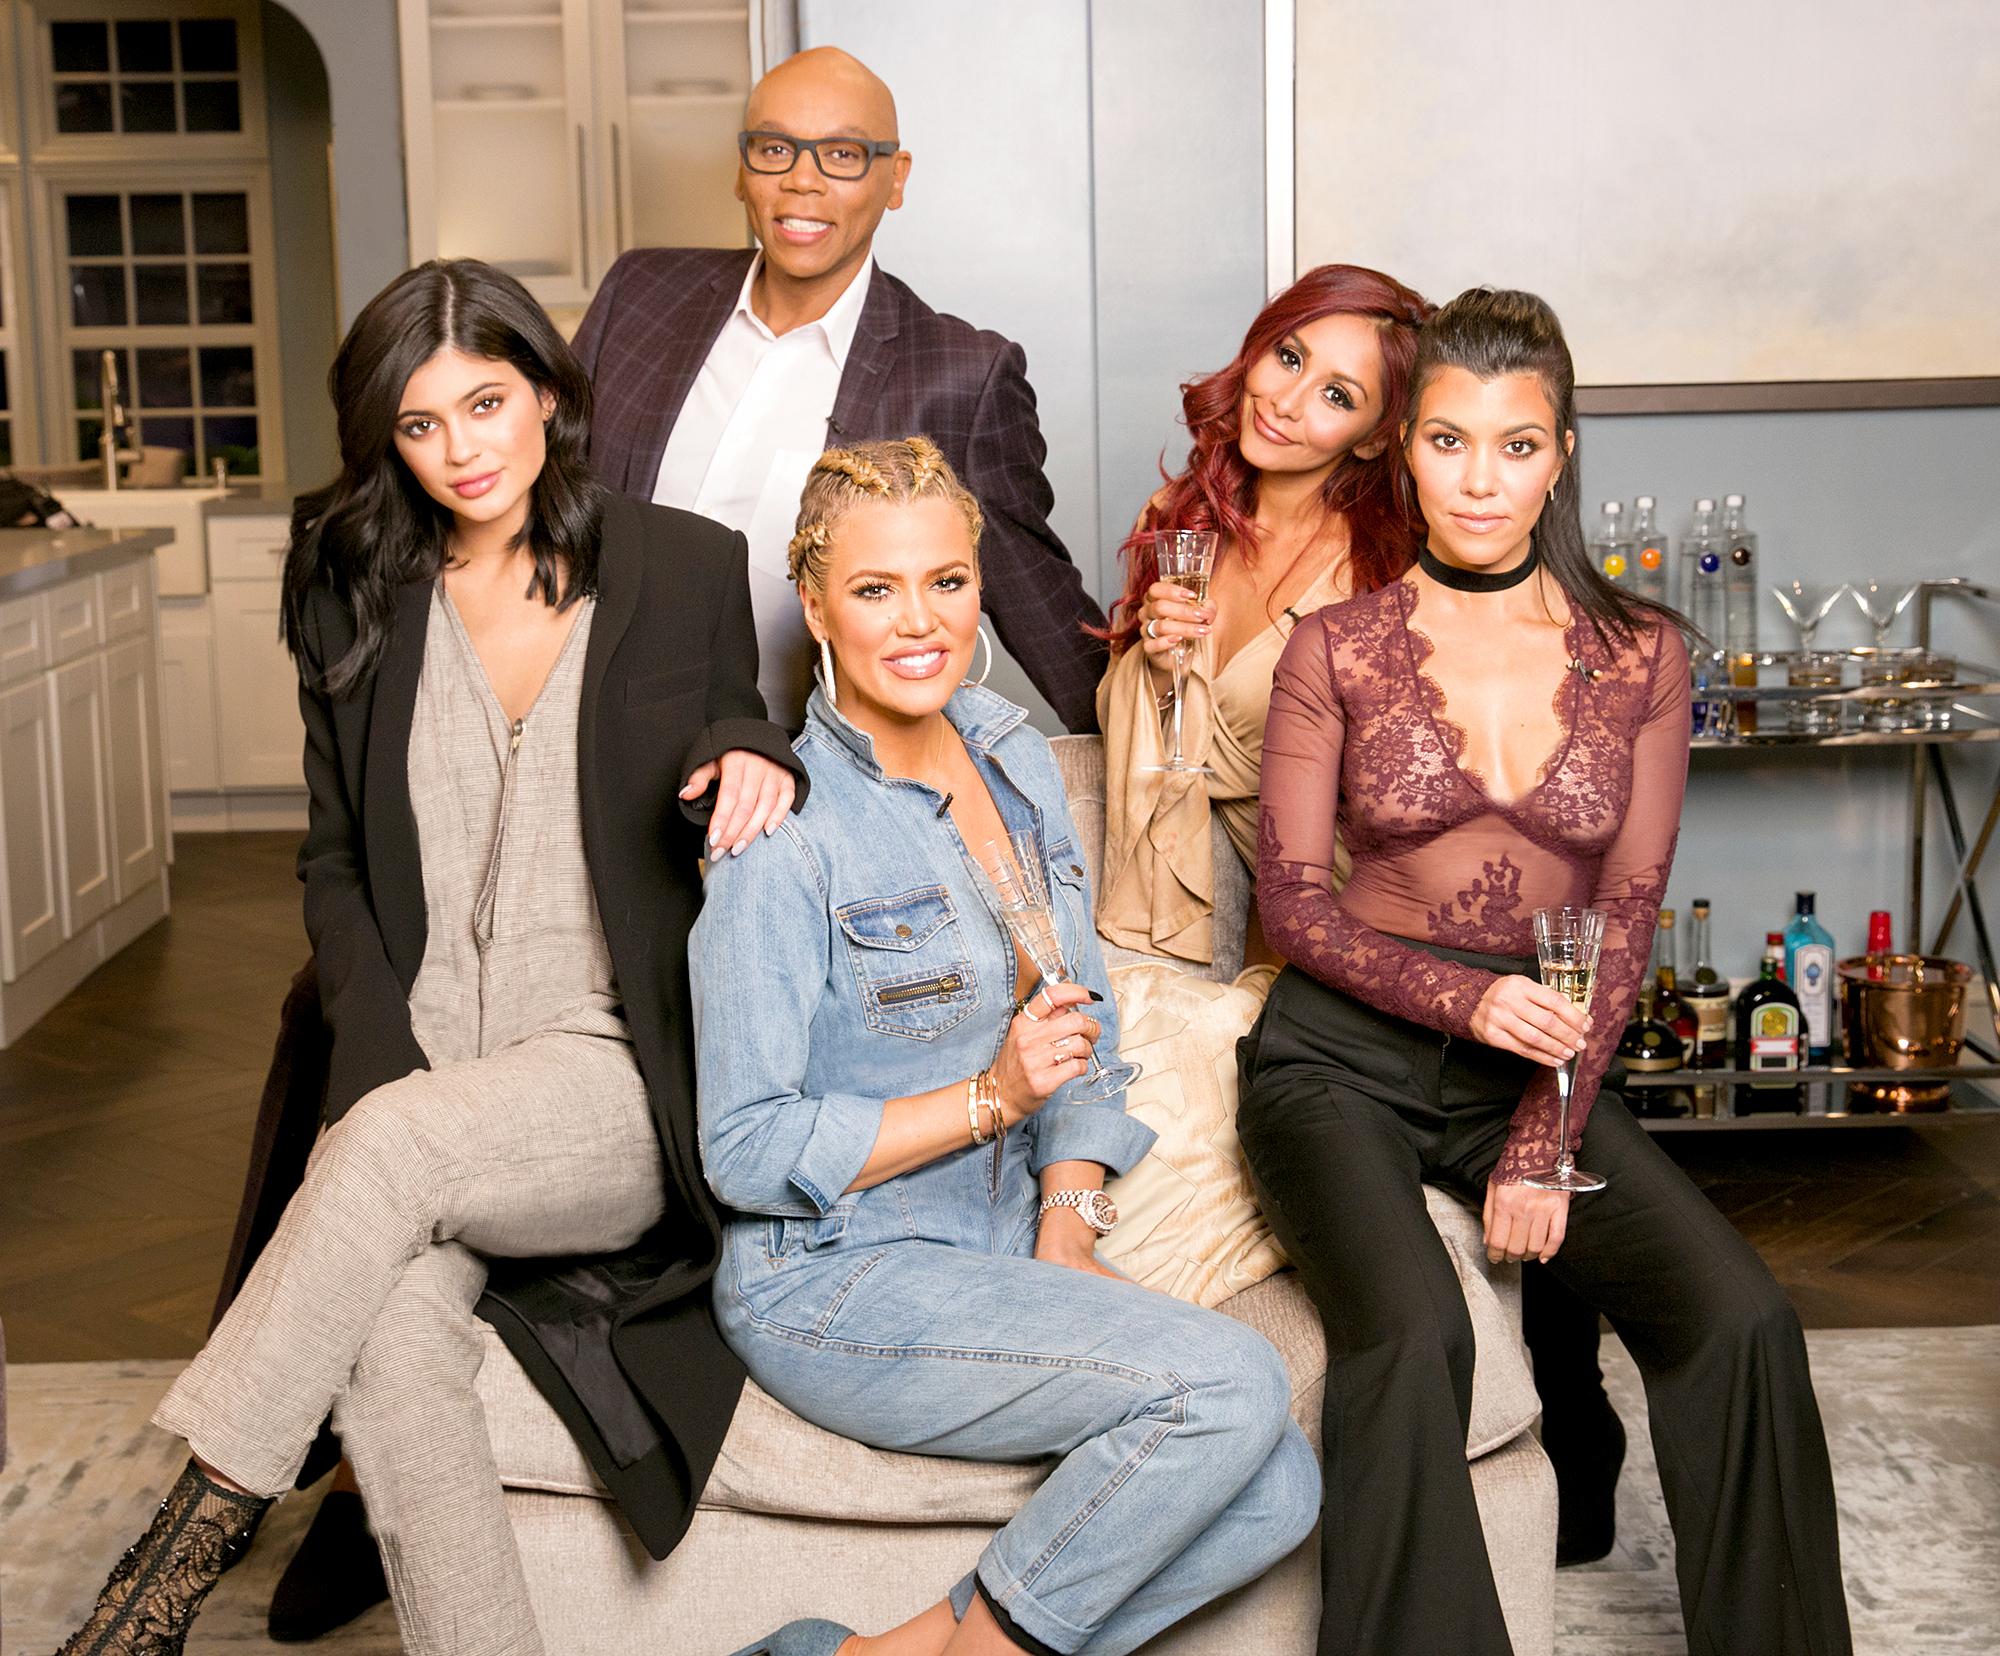 Kylie Jenner, RuPaul, Khloe Kardashian, Snooki and Kourtney Kardashian